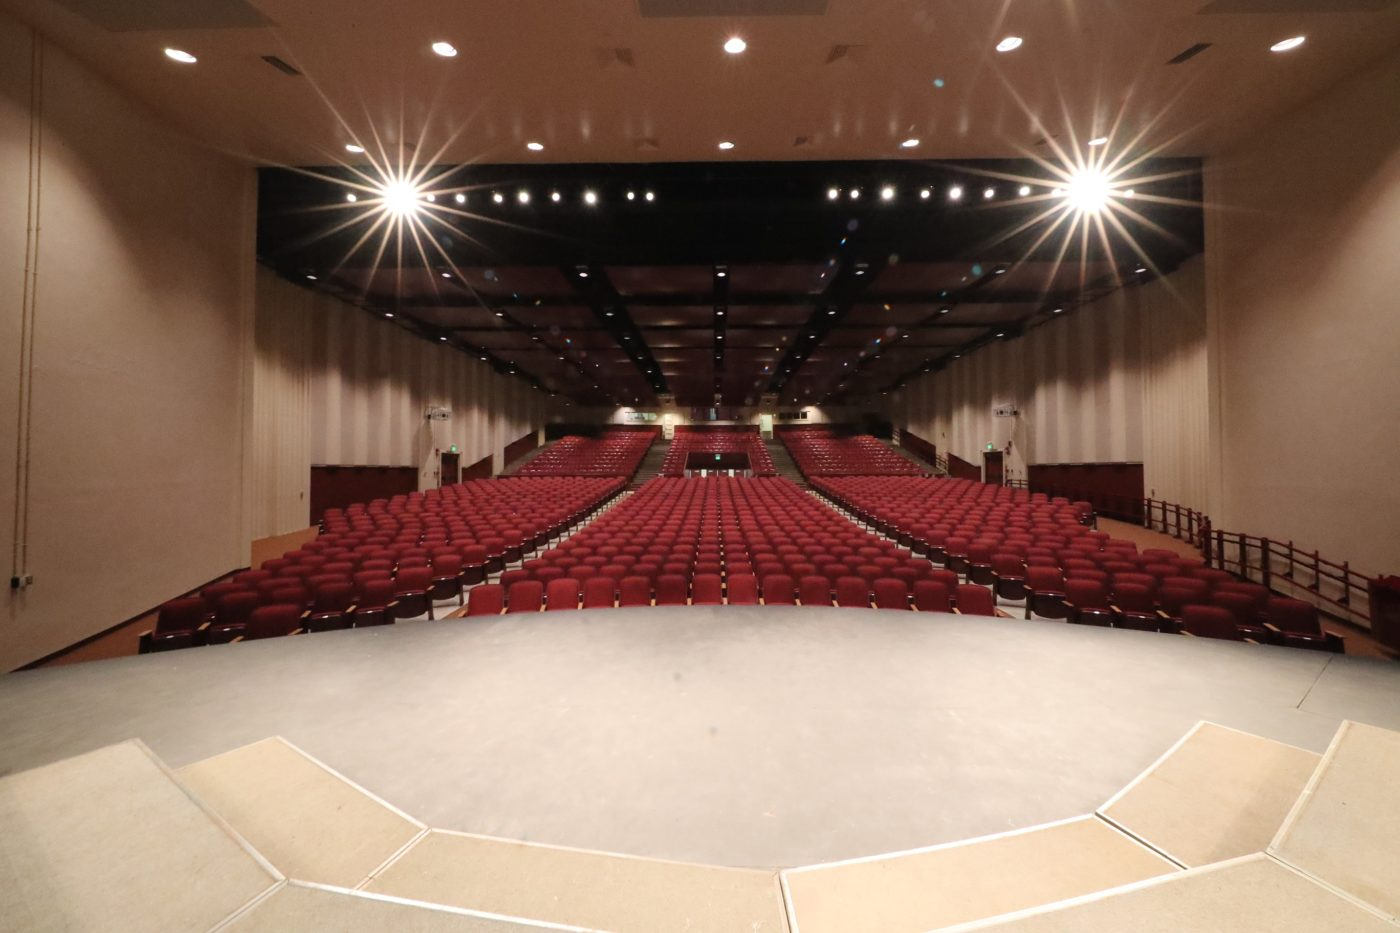 Farrington-High-School-Auditorium-2-e1494910134550